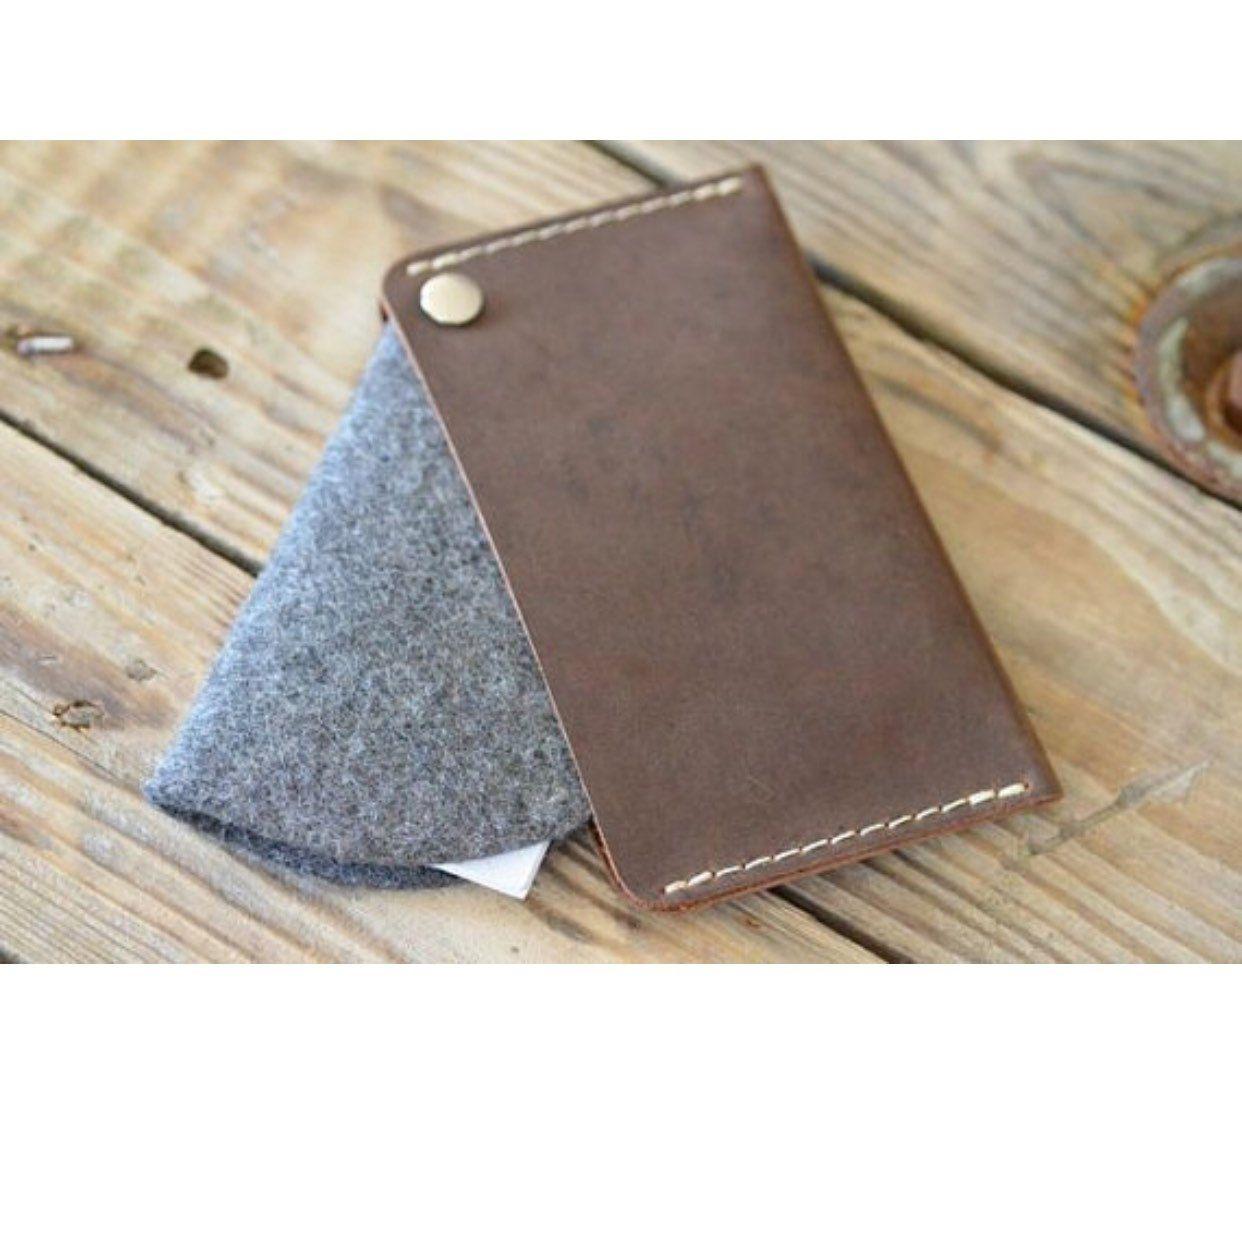 Leather Business Card Holder - BIGWIG | Organic Leather | Handmade ...